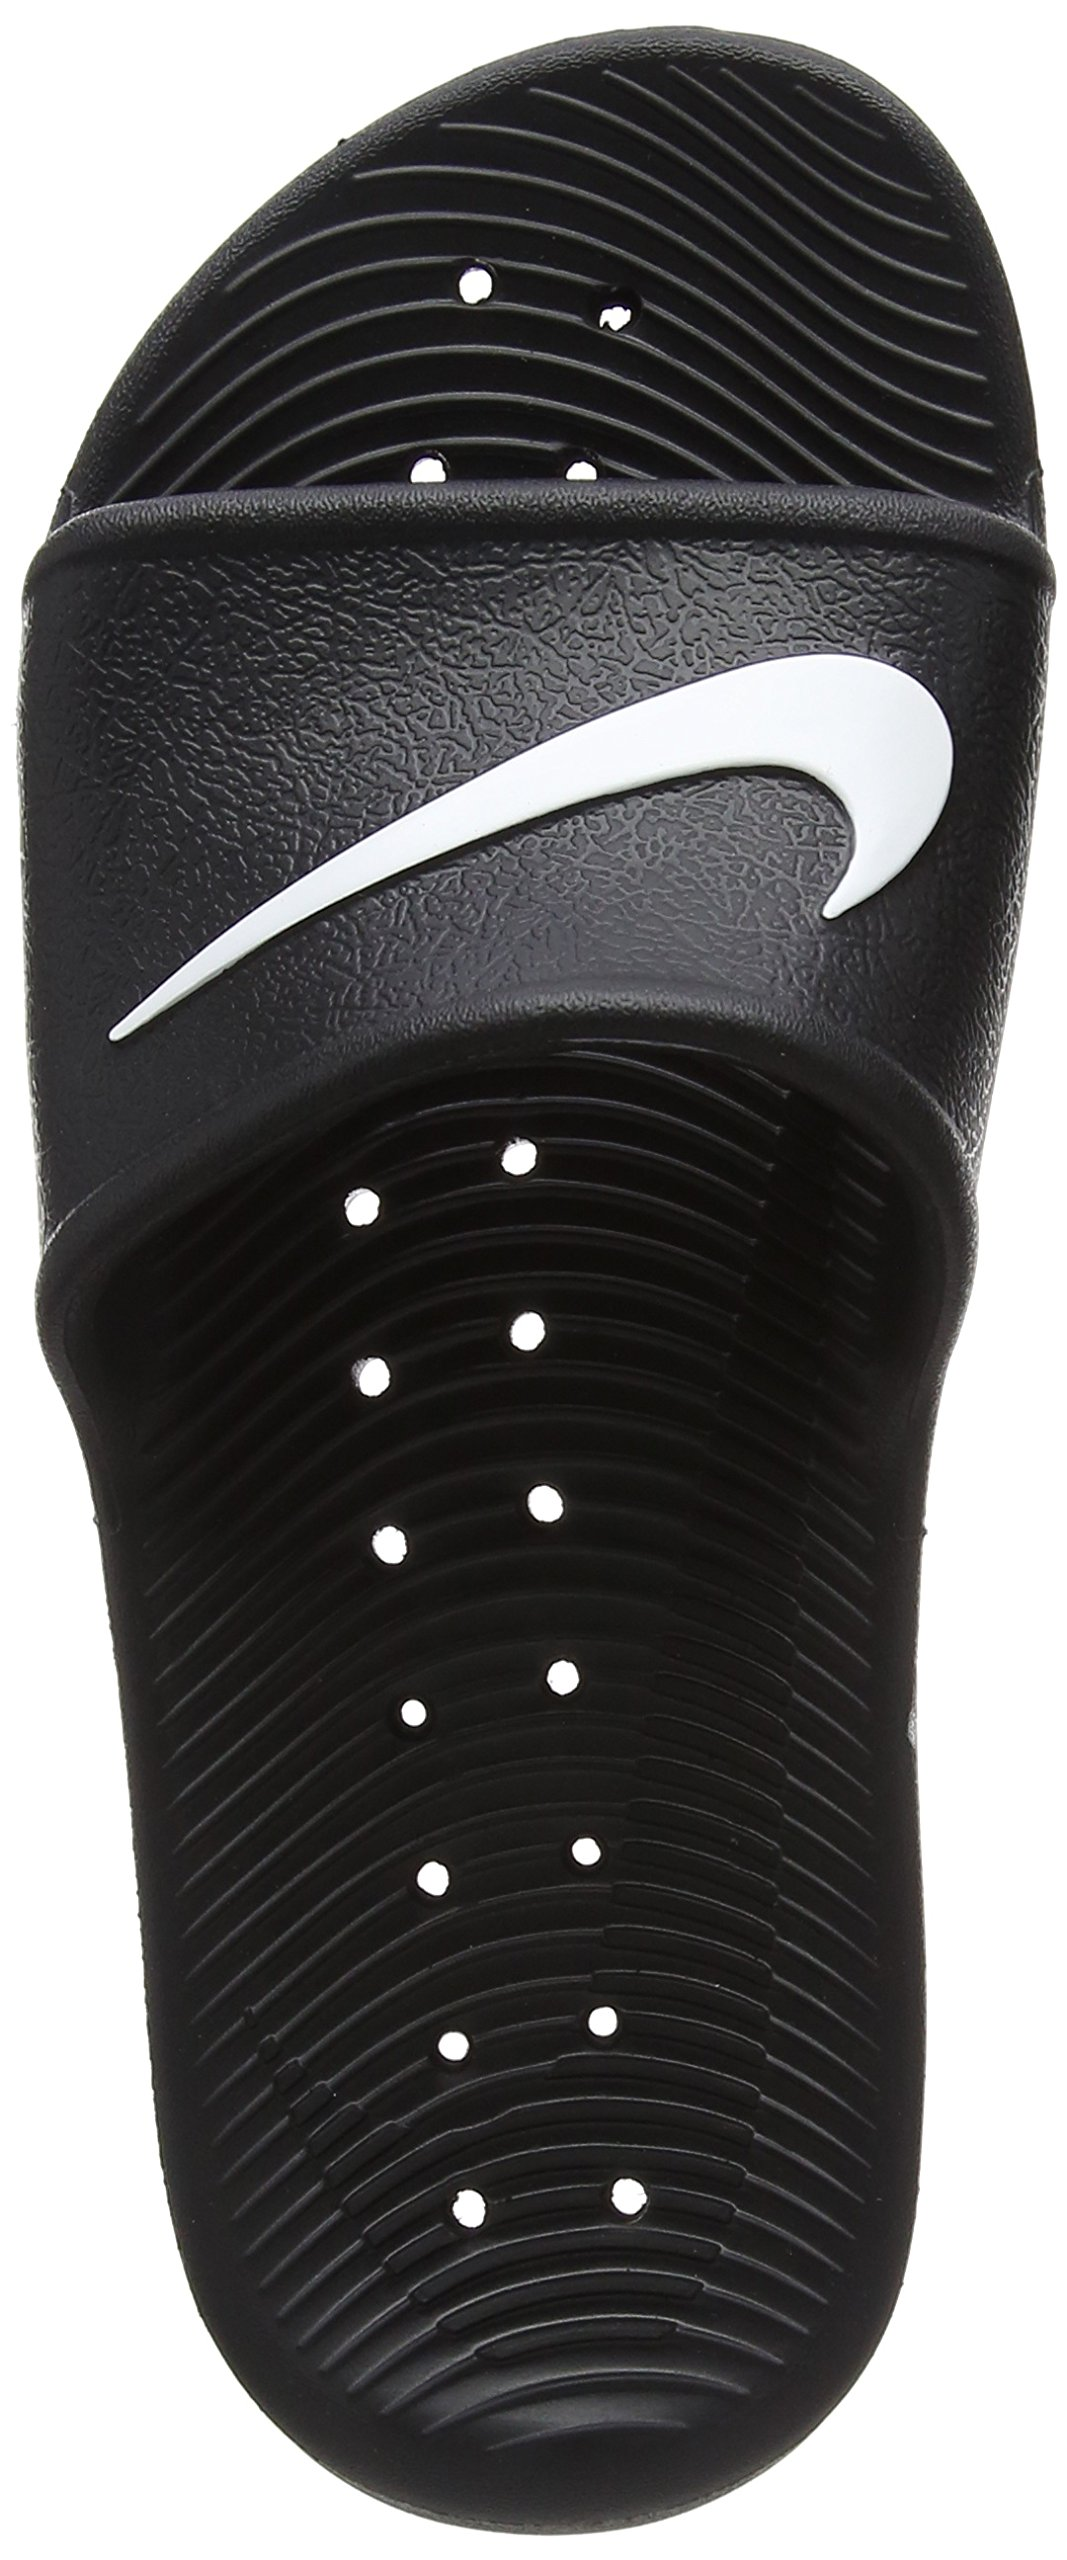 Nike Womens Kawa Sport Shower Slide Sandals Black/White (10)